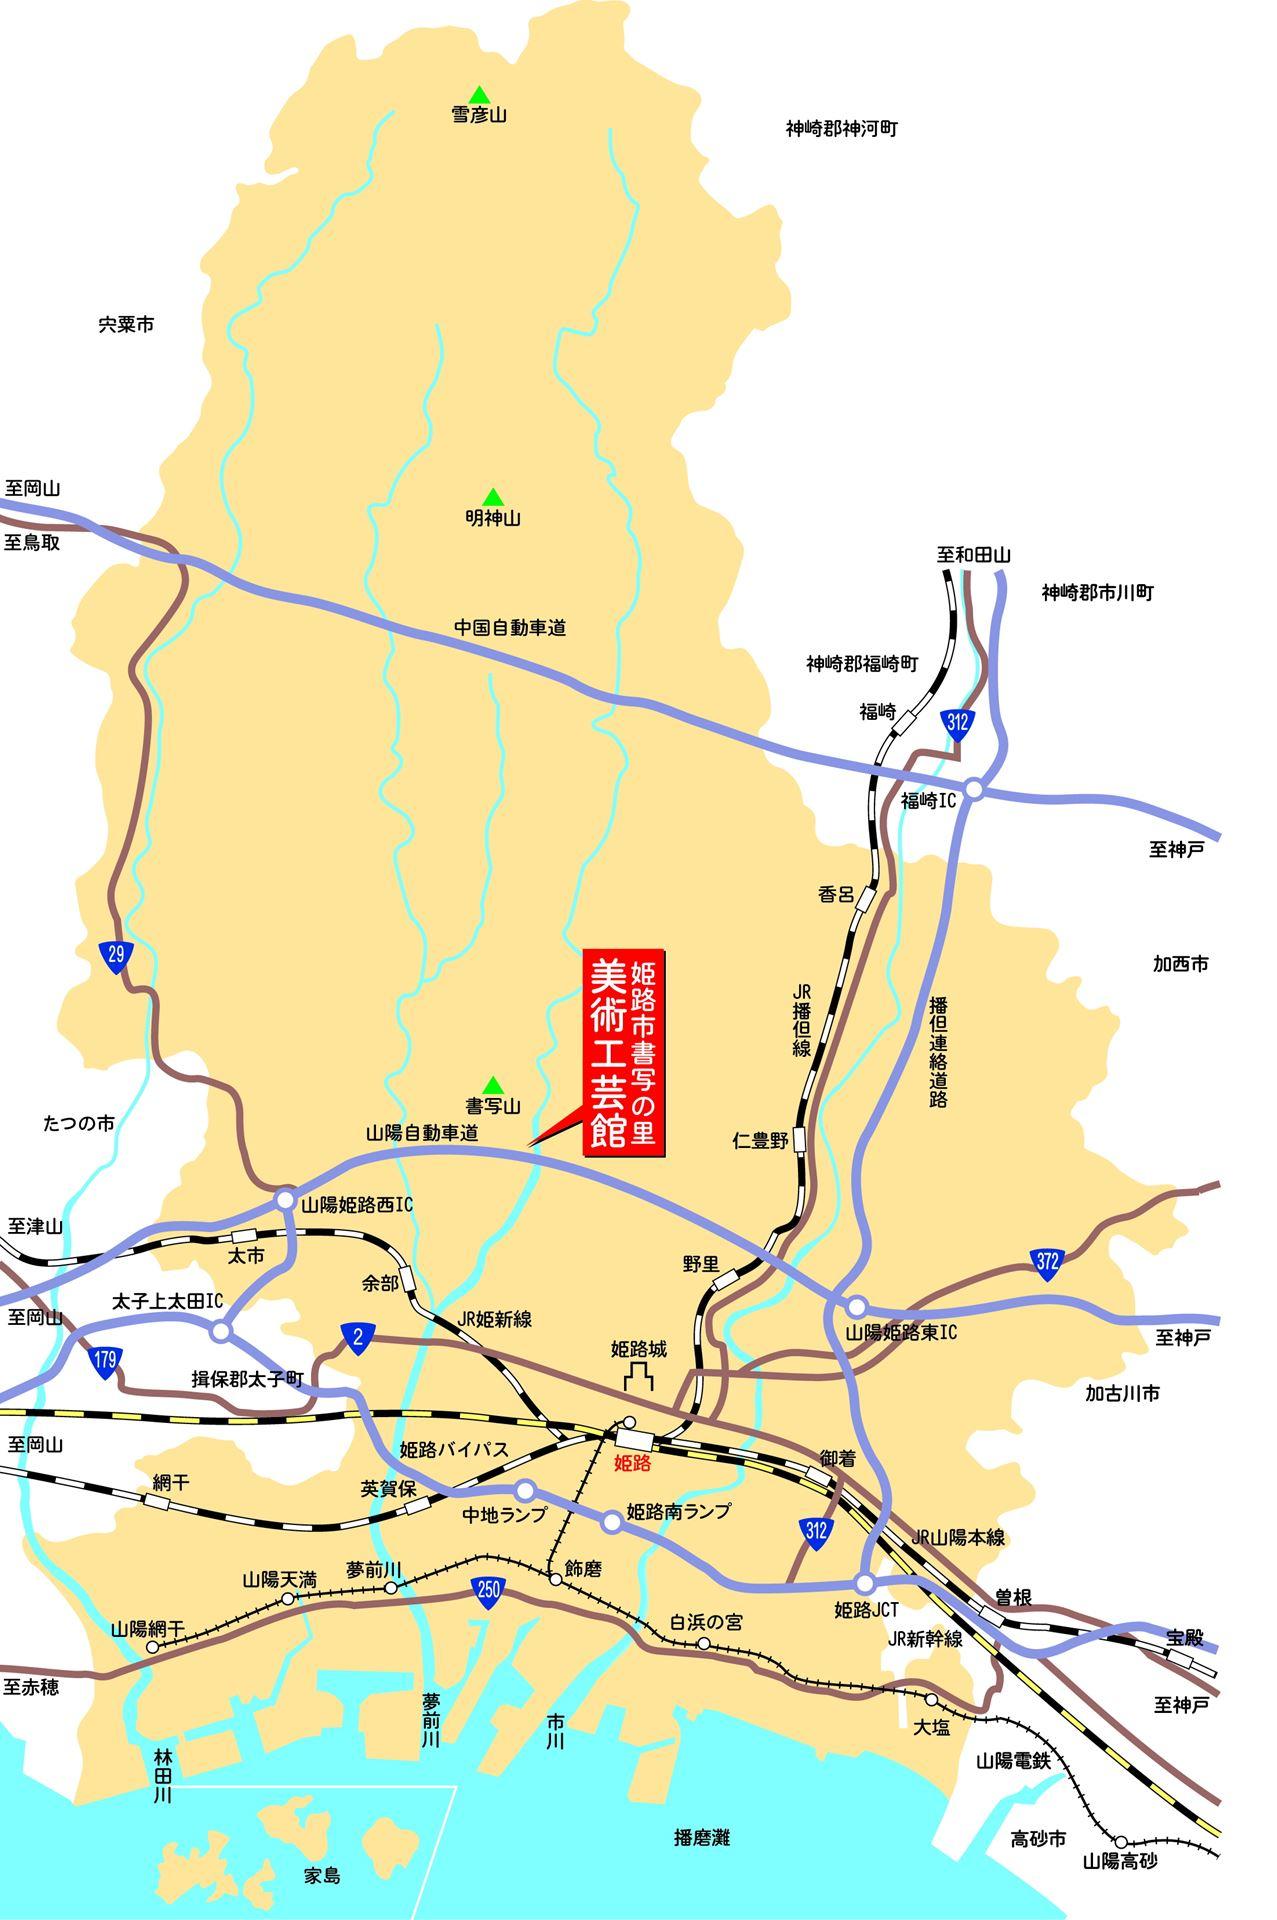 空中写真・地図にみる成田 - 成田市立図書館